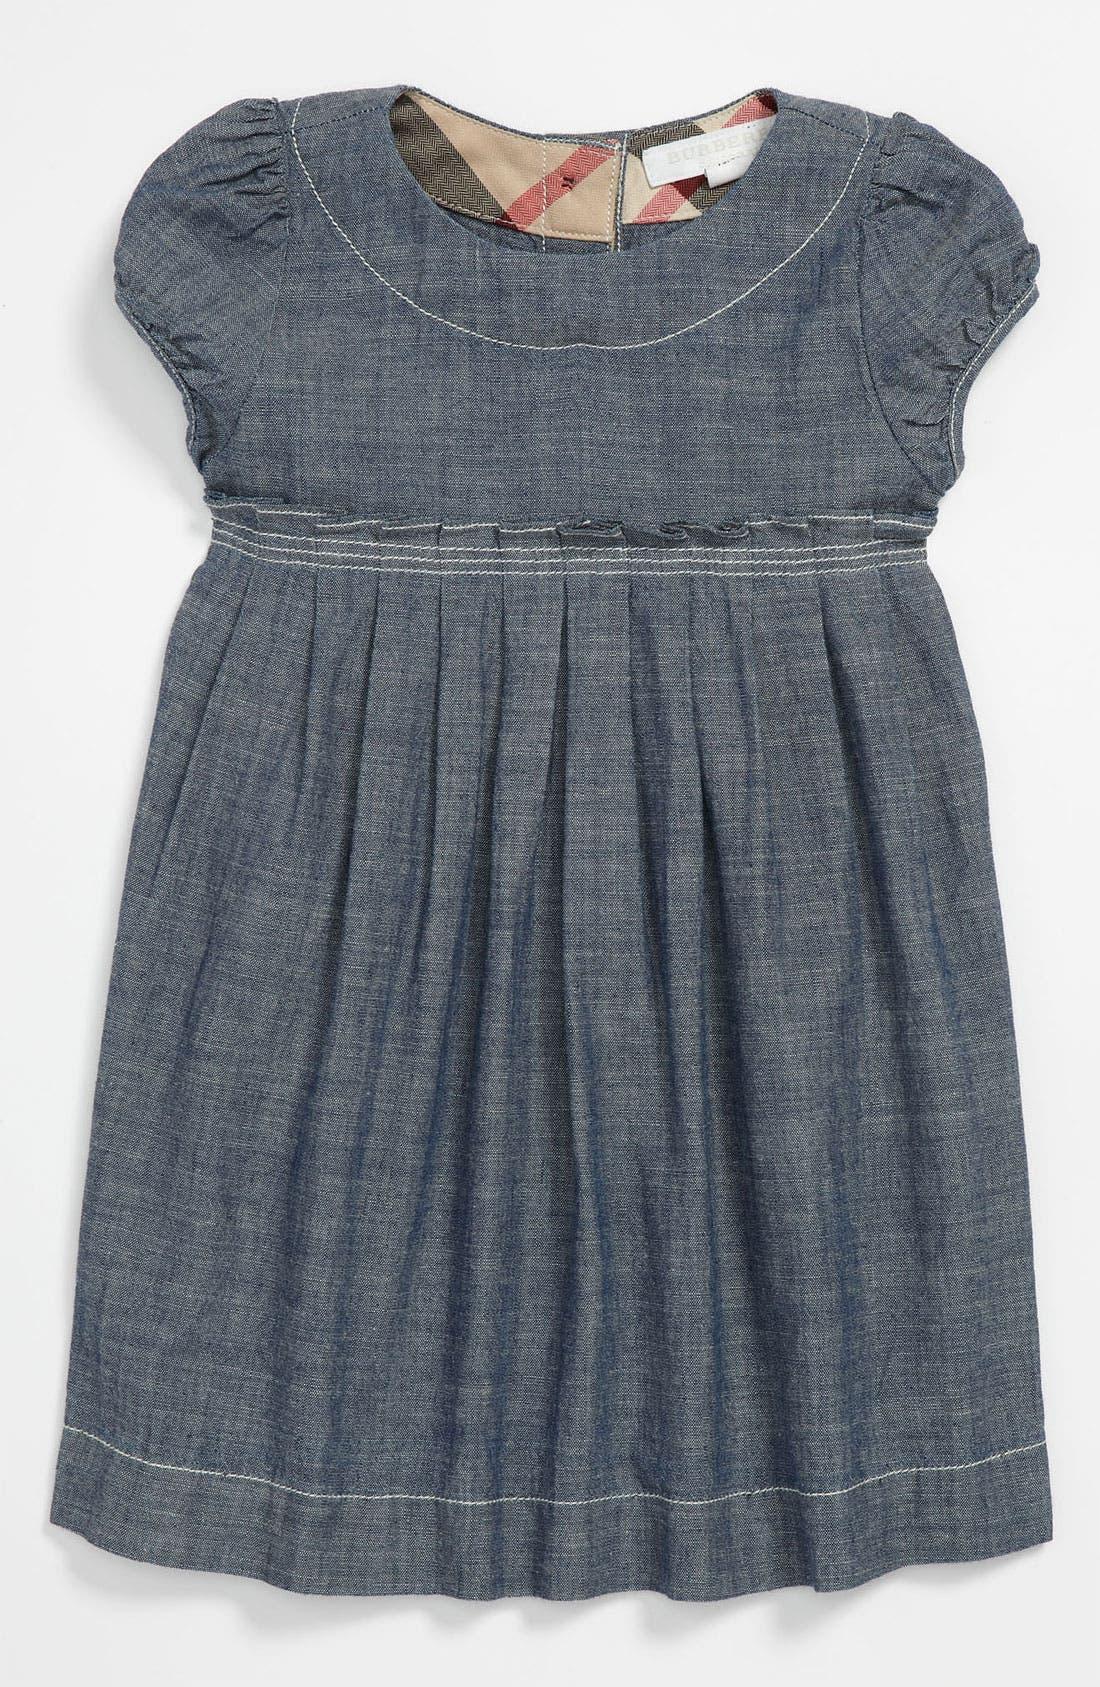 Main Image - Burberry 'Coralie' Dress (Infant)